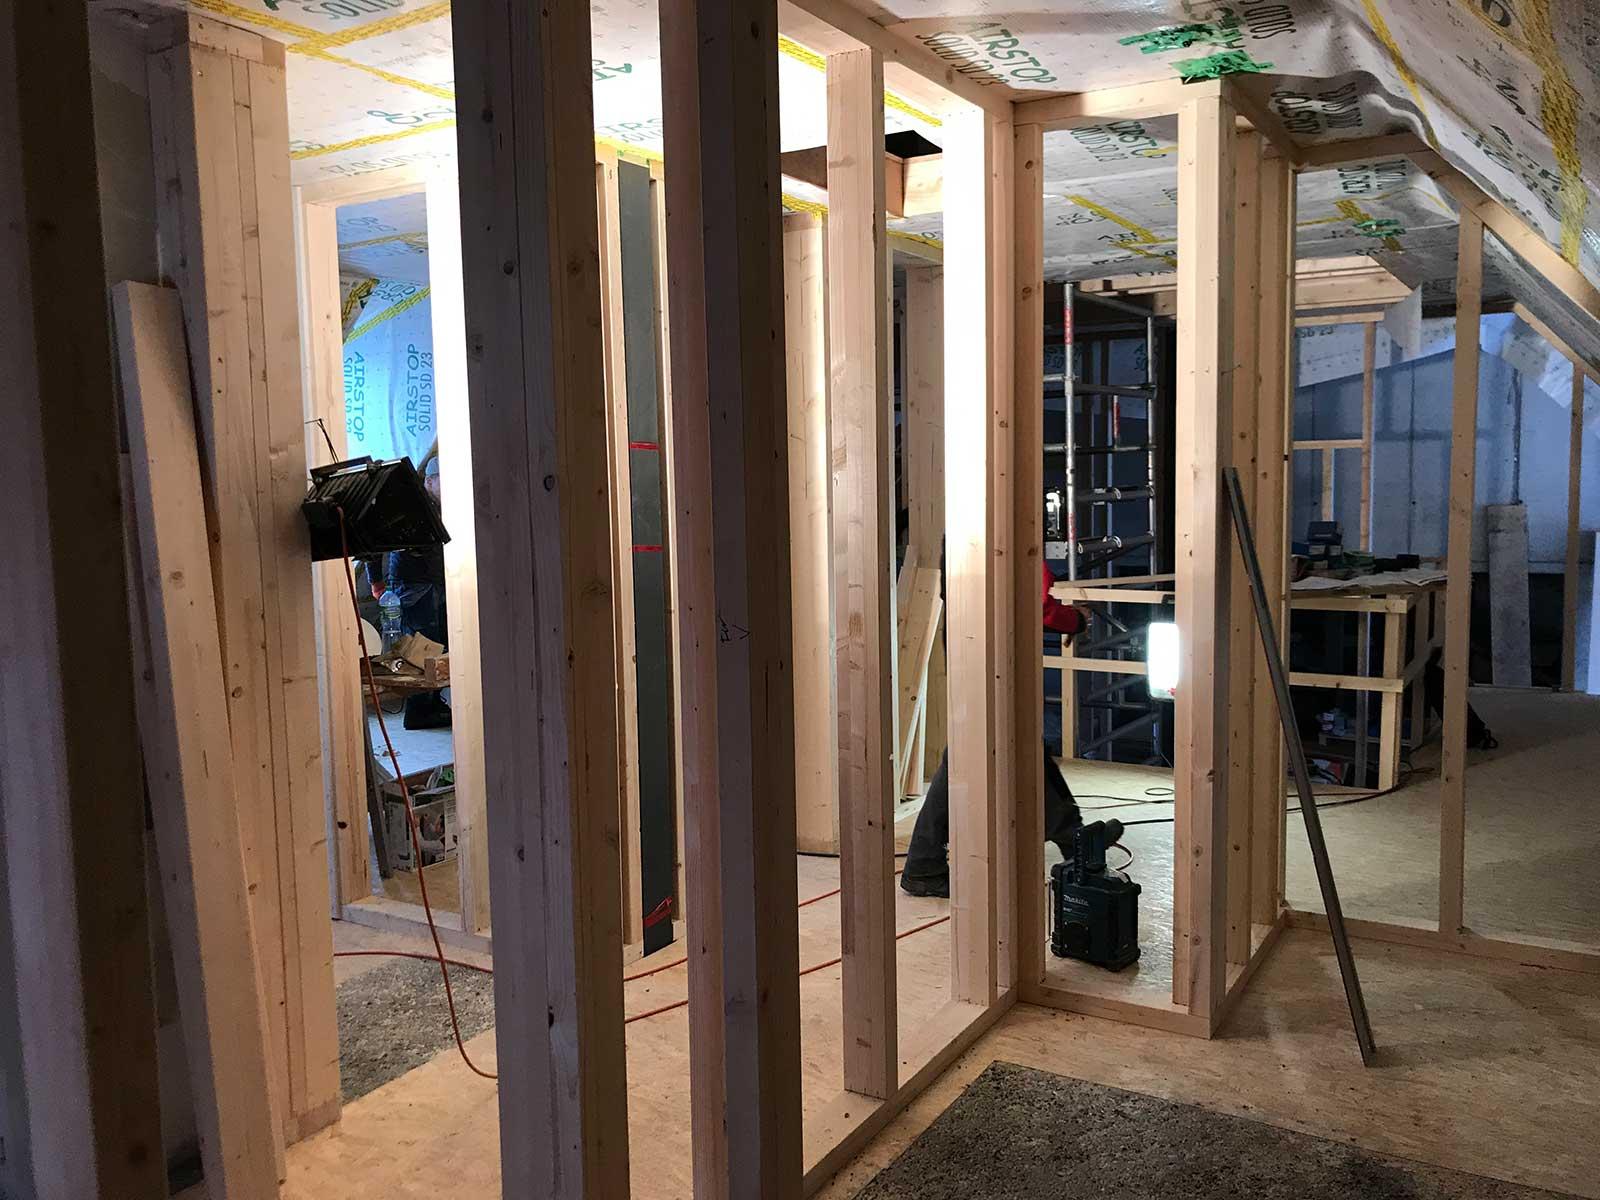 Baustellenfoto Ausbau Dachgeschoss, Holzständerbau